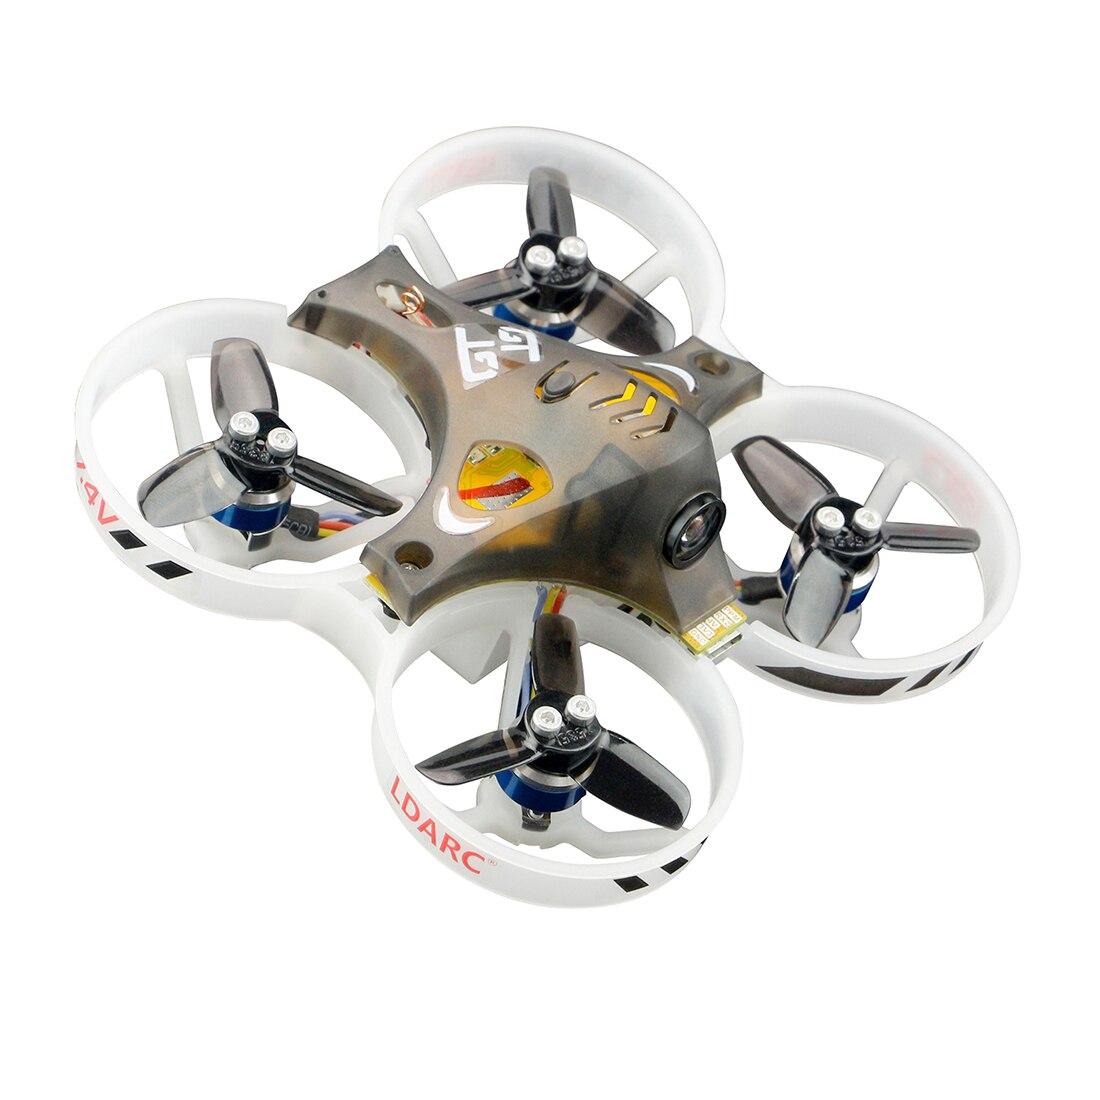 Nuevo LDARC pequeño GT7 75mm/GT8 87,6mm Mini FPV RC Racer Quadcopter Betaflight F3 10A Blheli_S 800TVL Cam 5,8G 25mW VTX 2S PNP BNF